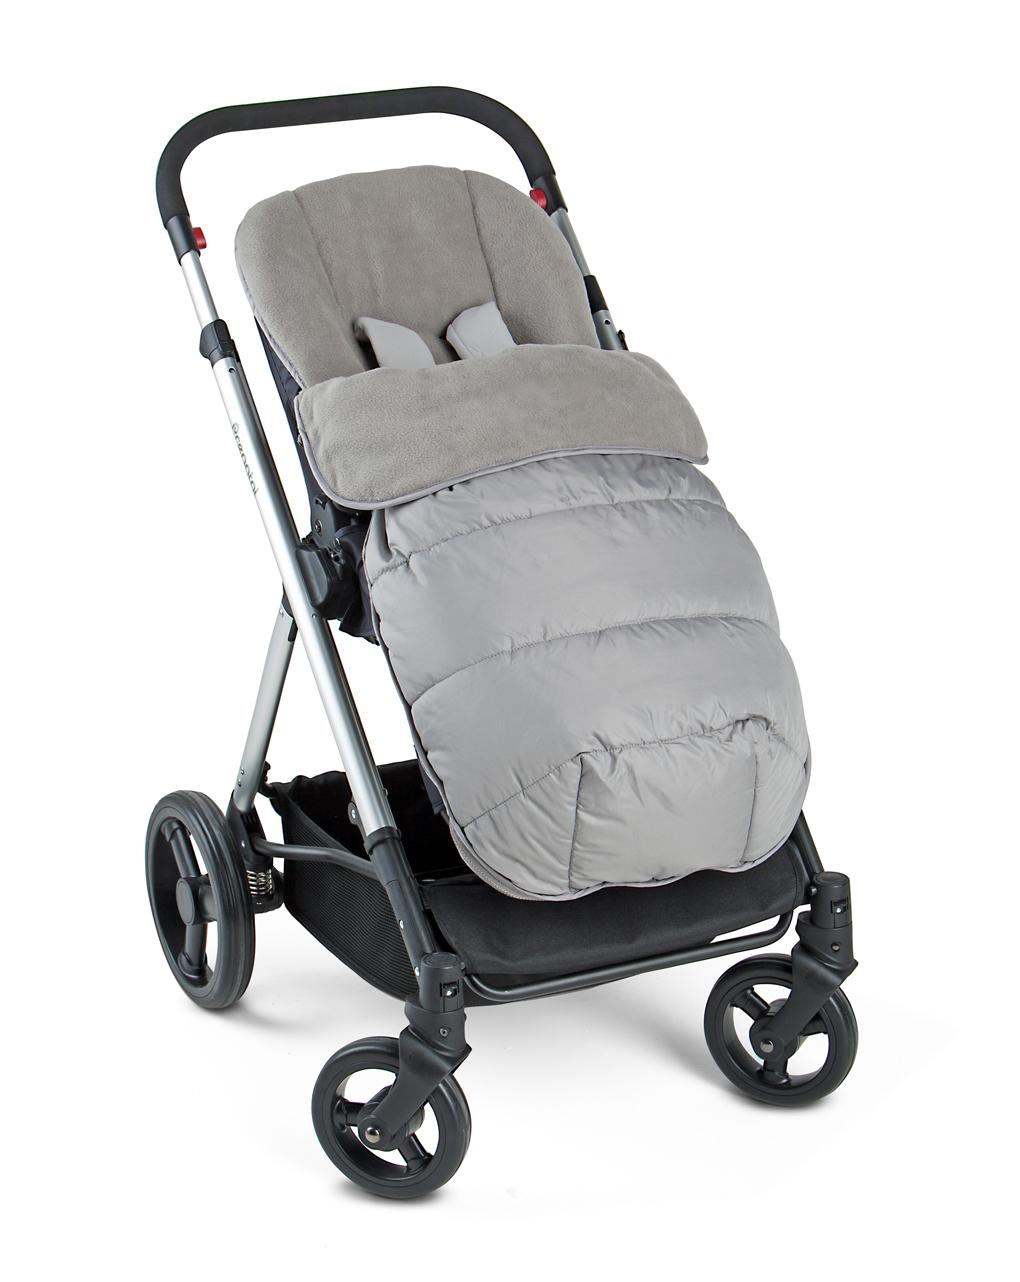 b0967dfbb372 Sacco per passeggino grey - PASSEGGINI